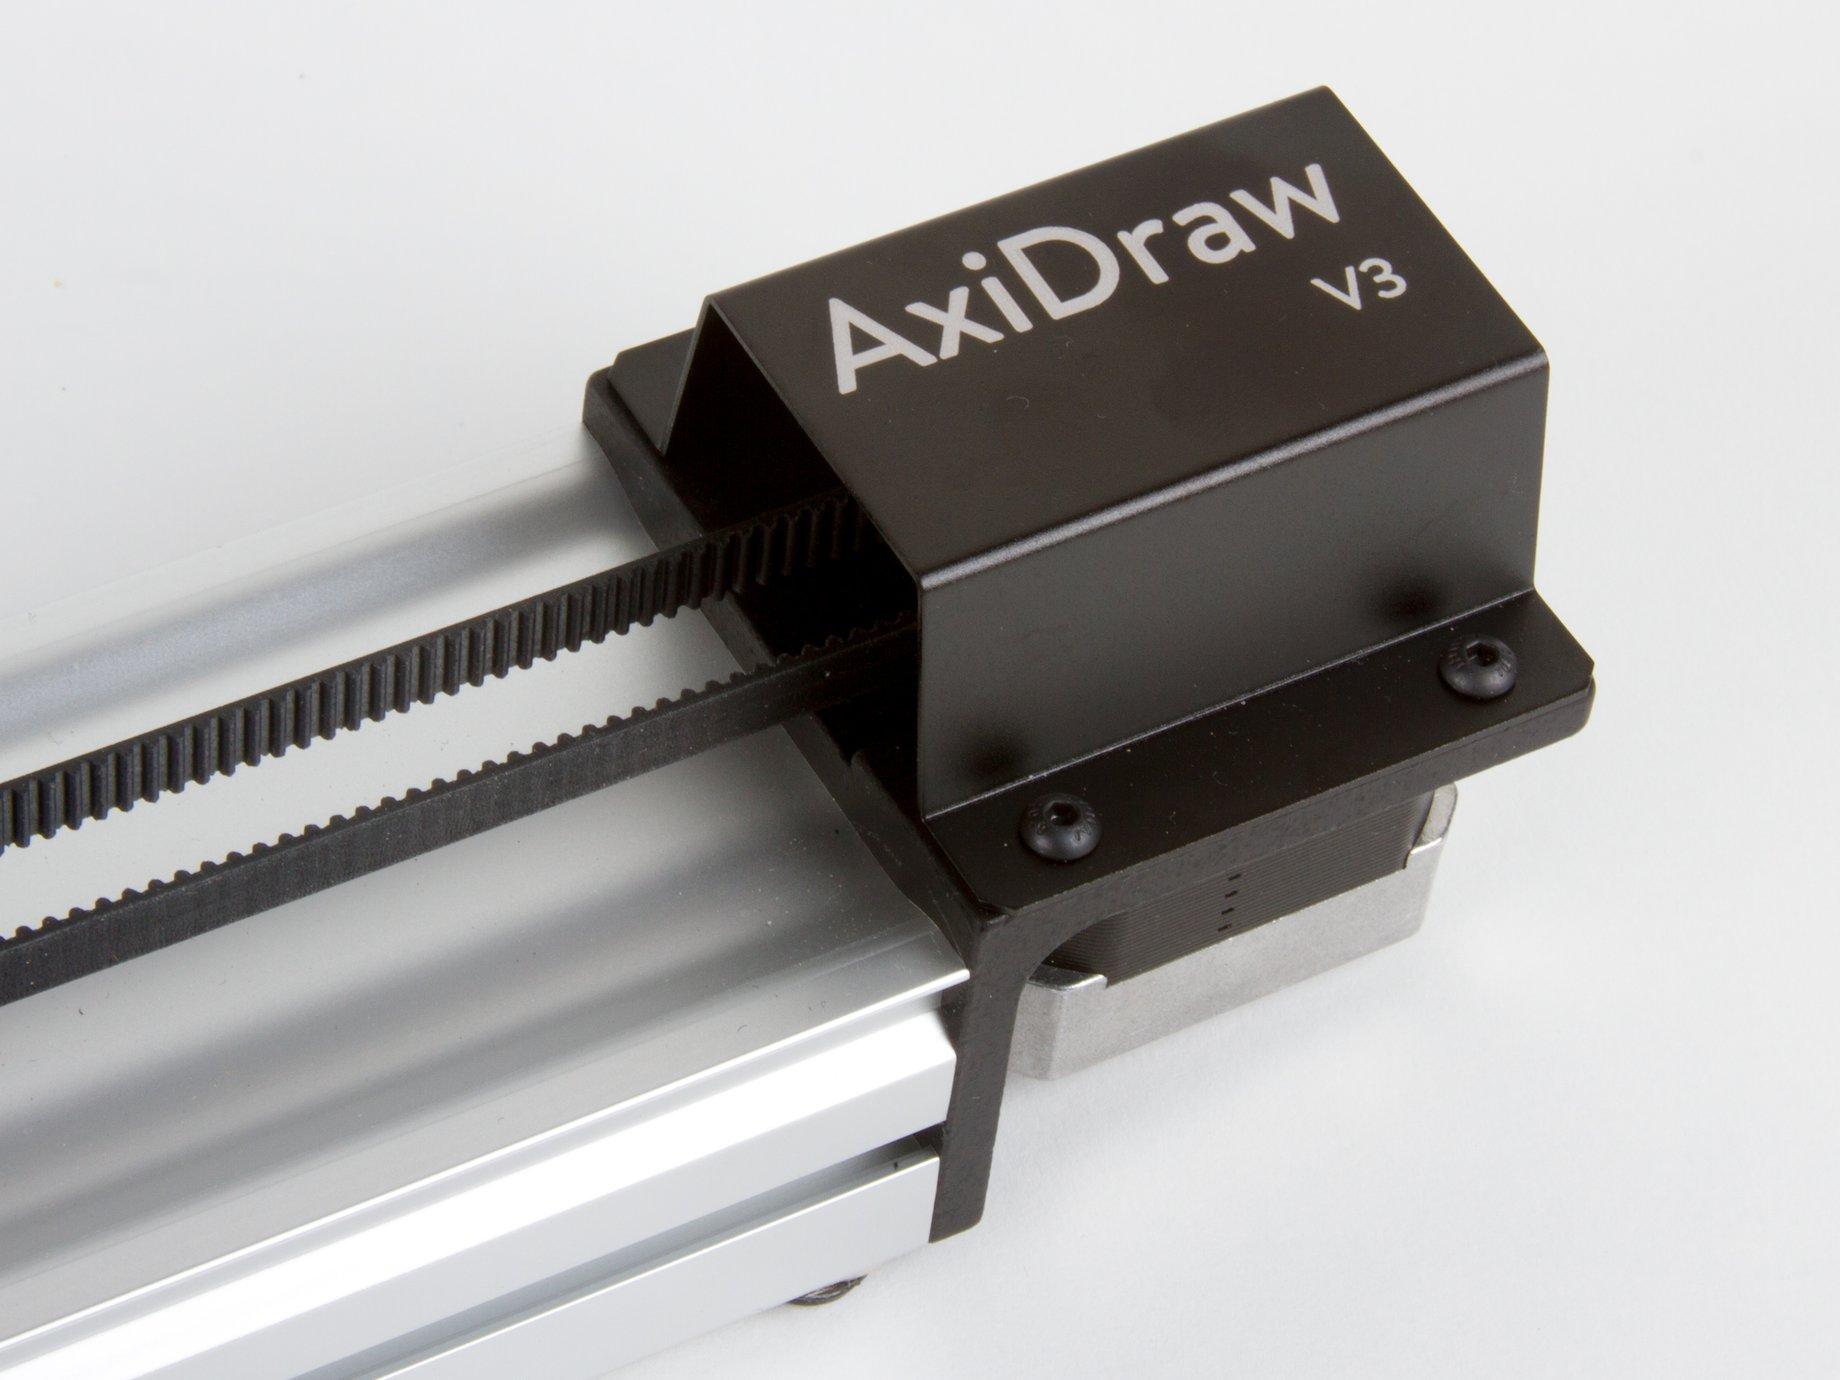 Axidraw V3 Stock Photo Printed Circuit Board And Precision Tools On Diagram Of Sku 2510